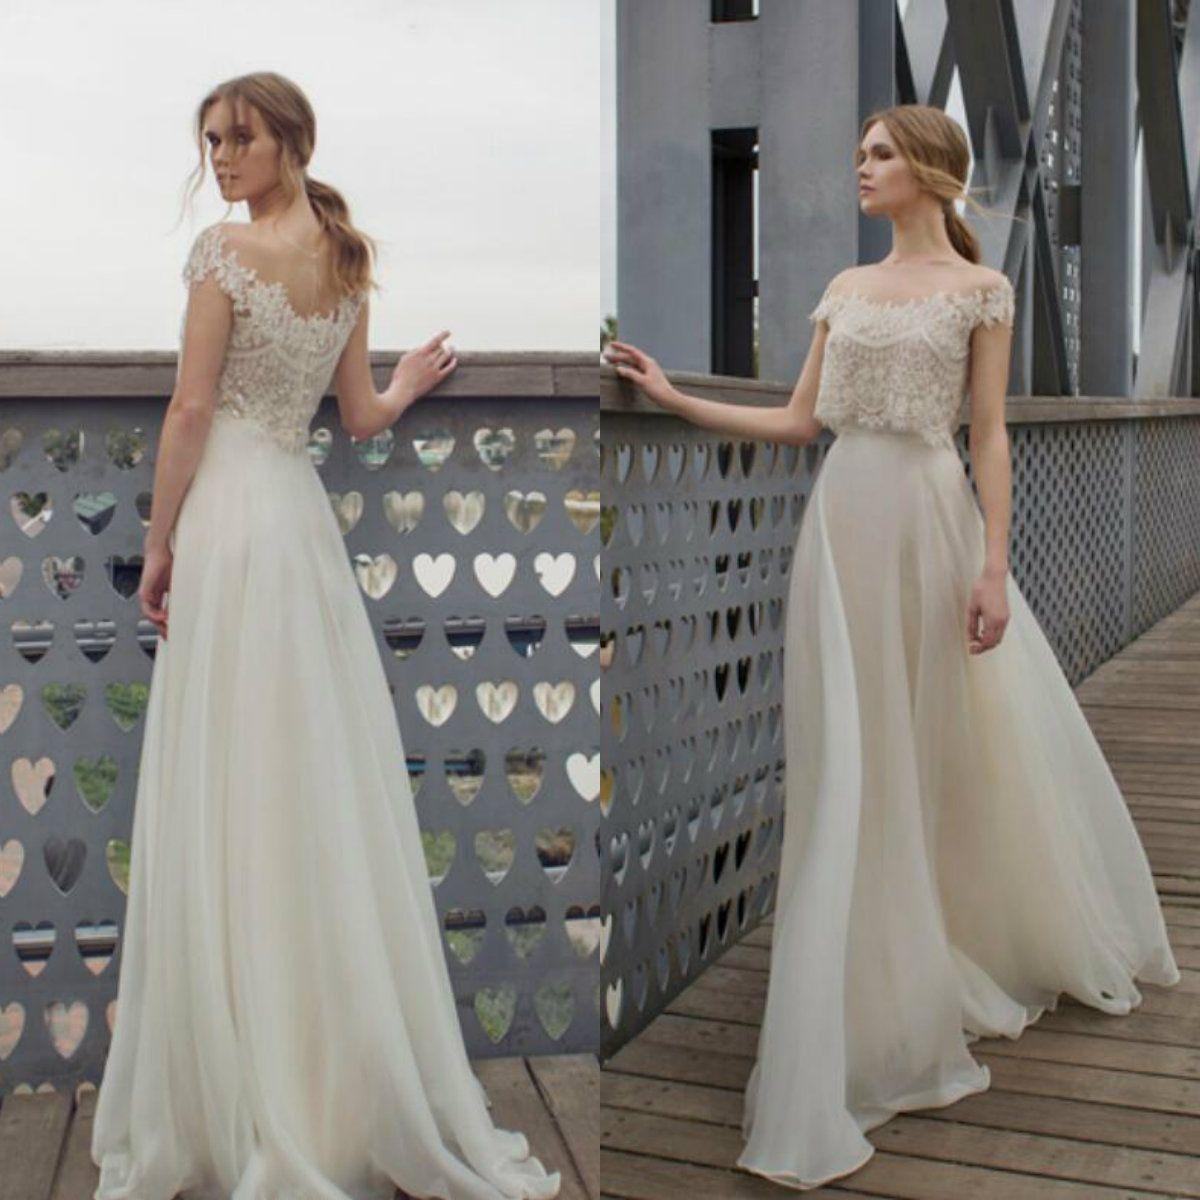 Limor Rosen Summer Boho Wedding Dresses Sheer Neck Lace Short Sleeves Chiffon Beach Wedding Dress Cheap Bridal Gowns Custom Made